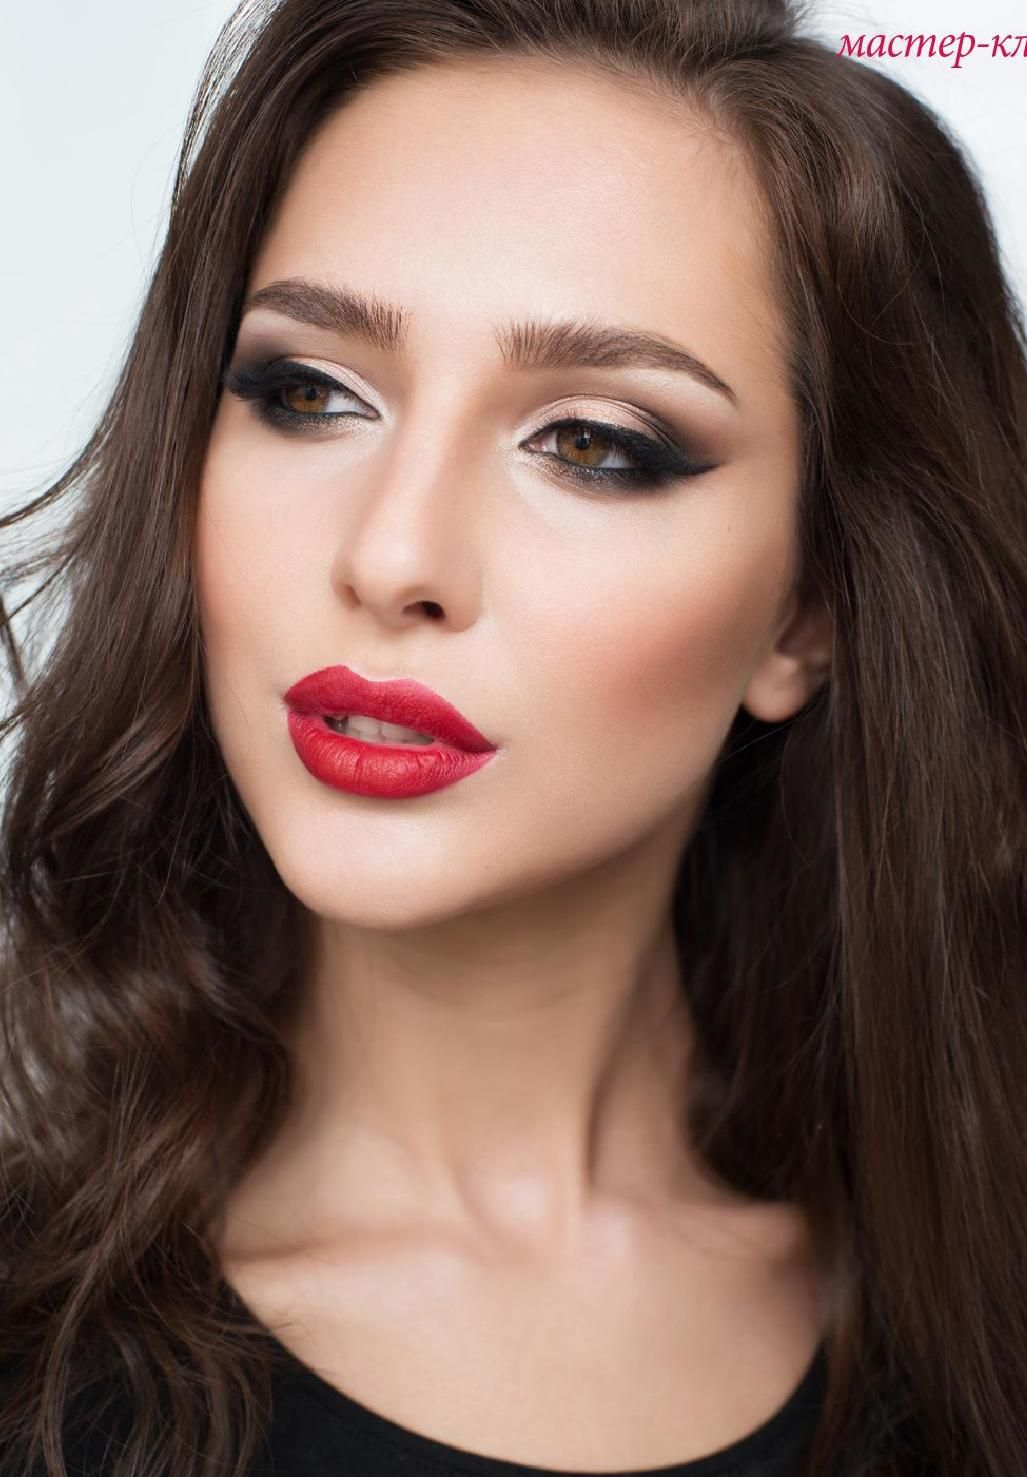 Industriya krasoti 25 Hooded eye makeup, Makeup for